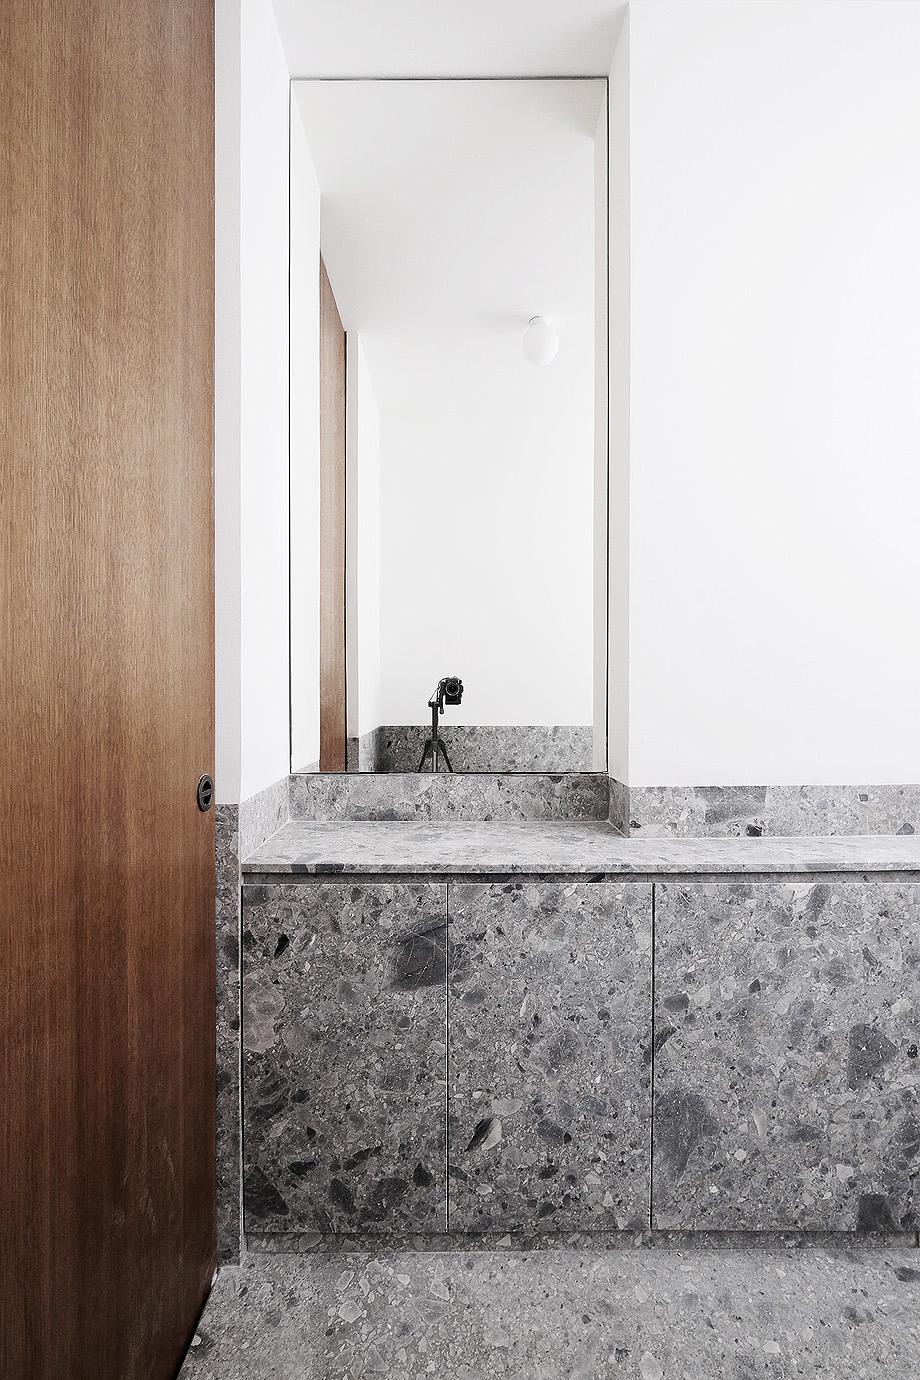 apartamento p-420 de nicolas dorval-bory - foto nicolas dorval-bory (9)